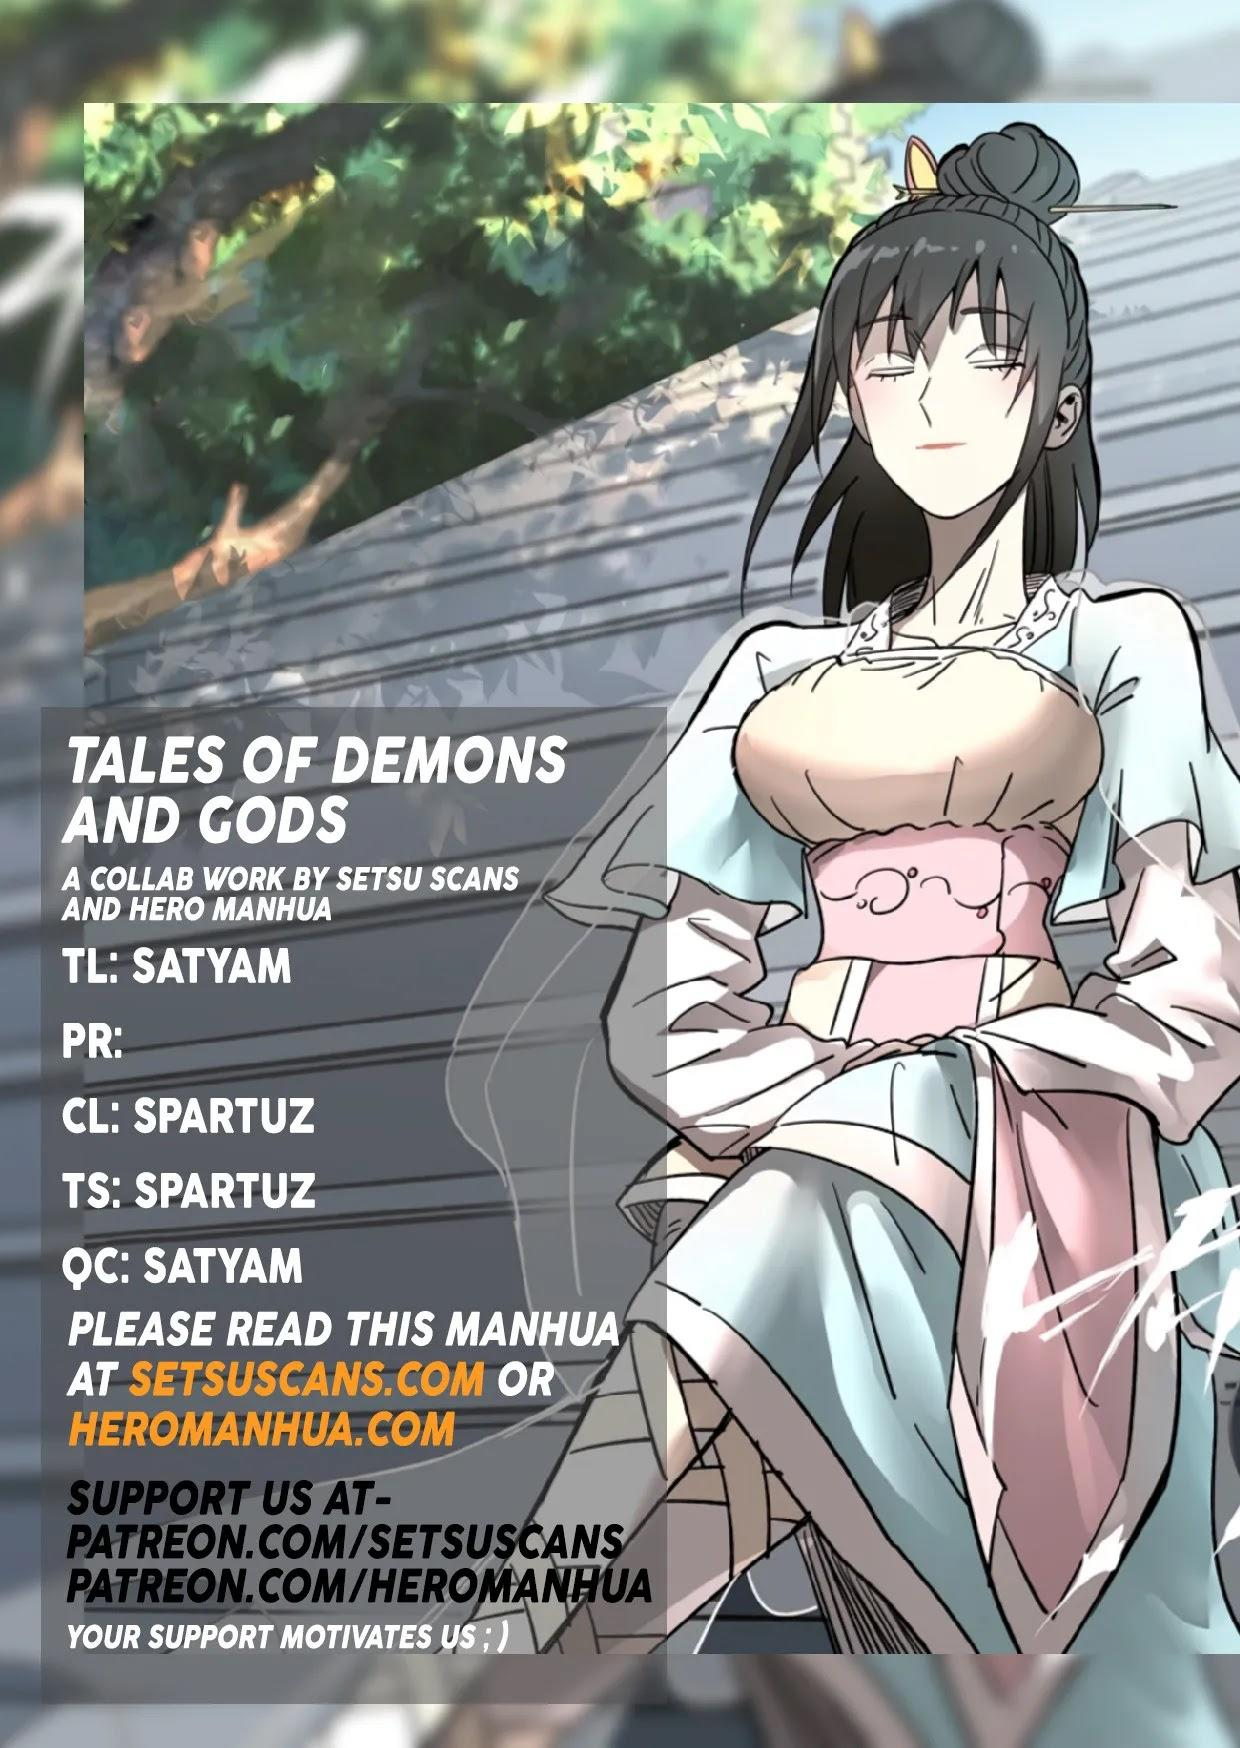 Tales Of Demons And Gods Chapter 342.1 page 1 - Mangakakalot